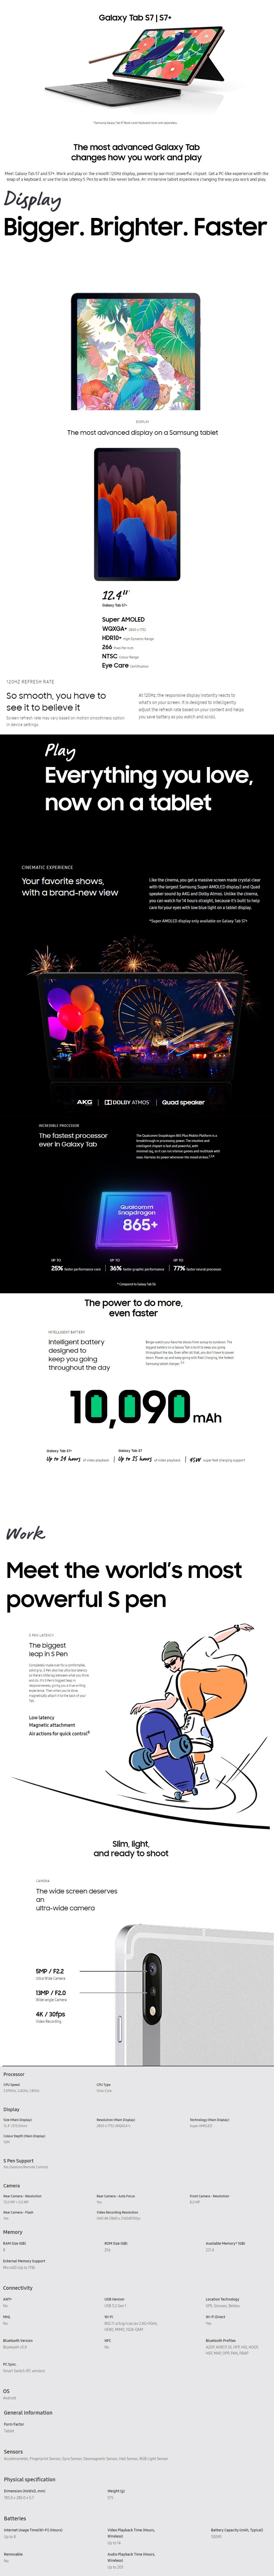 "Samsung Galaxy Tab S7+ 12.4"" 256GB Wi-Fi - Silver - Overview 1"